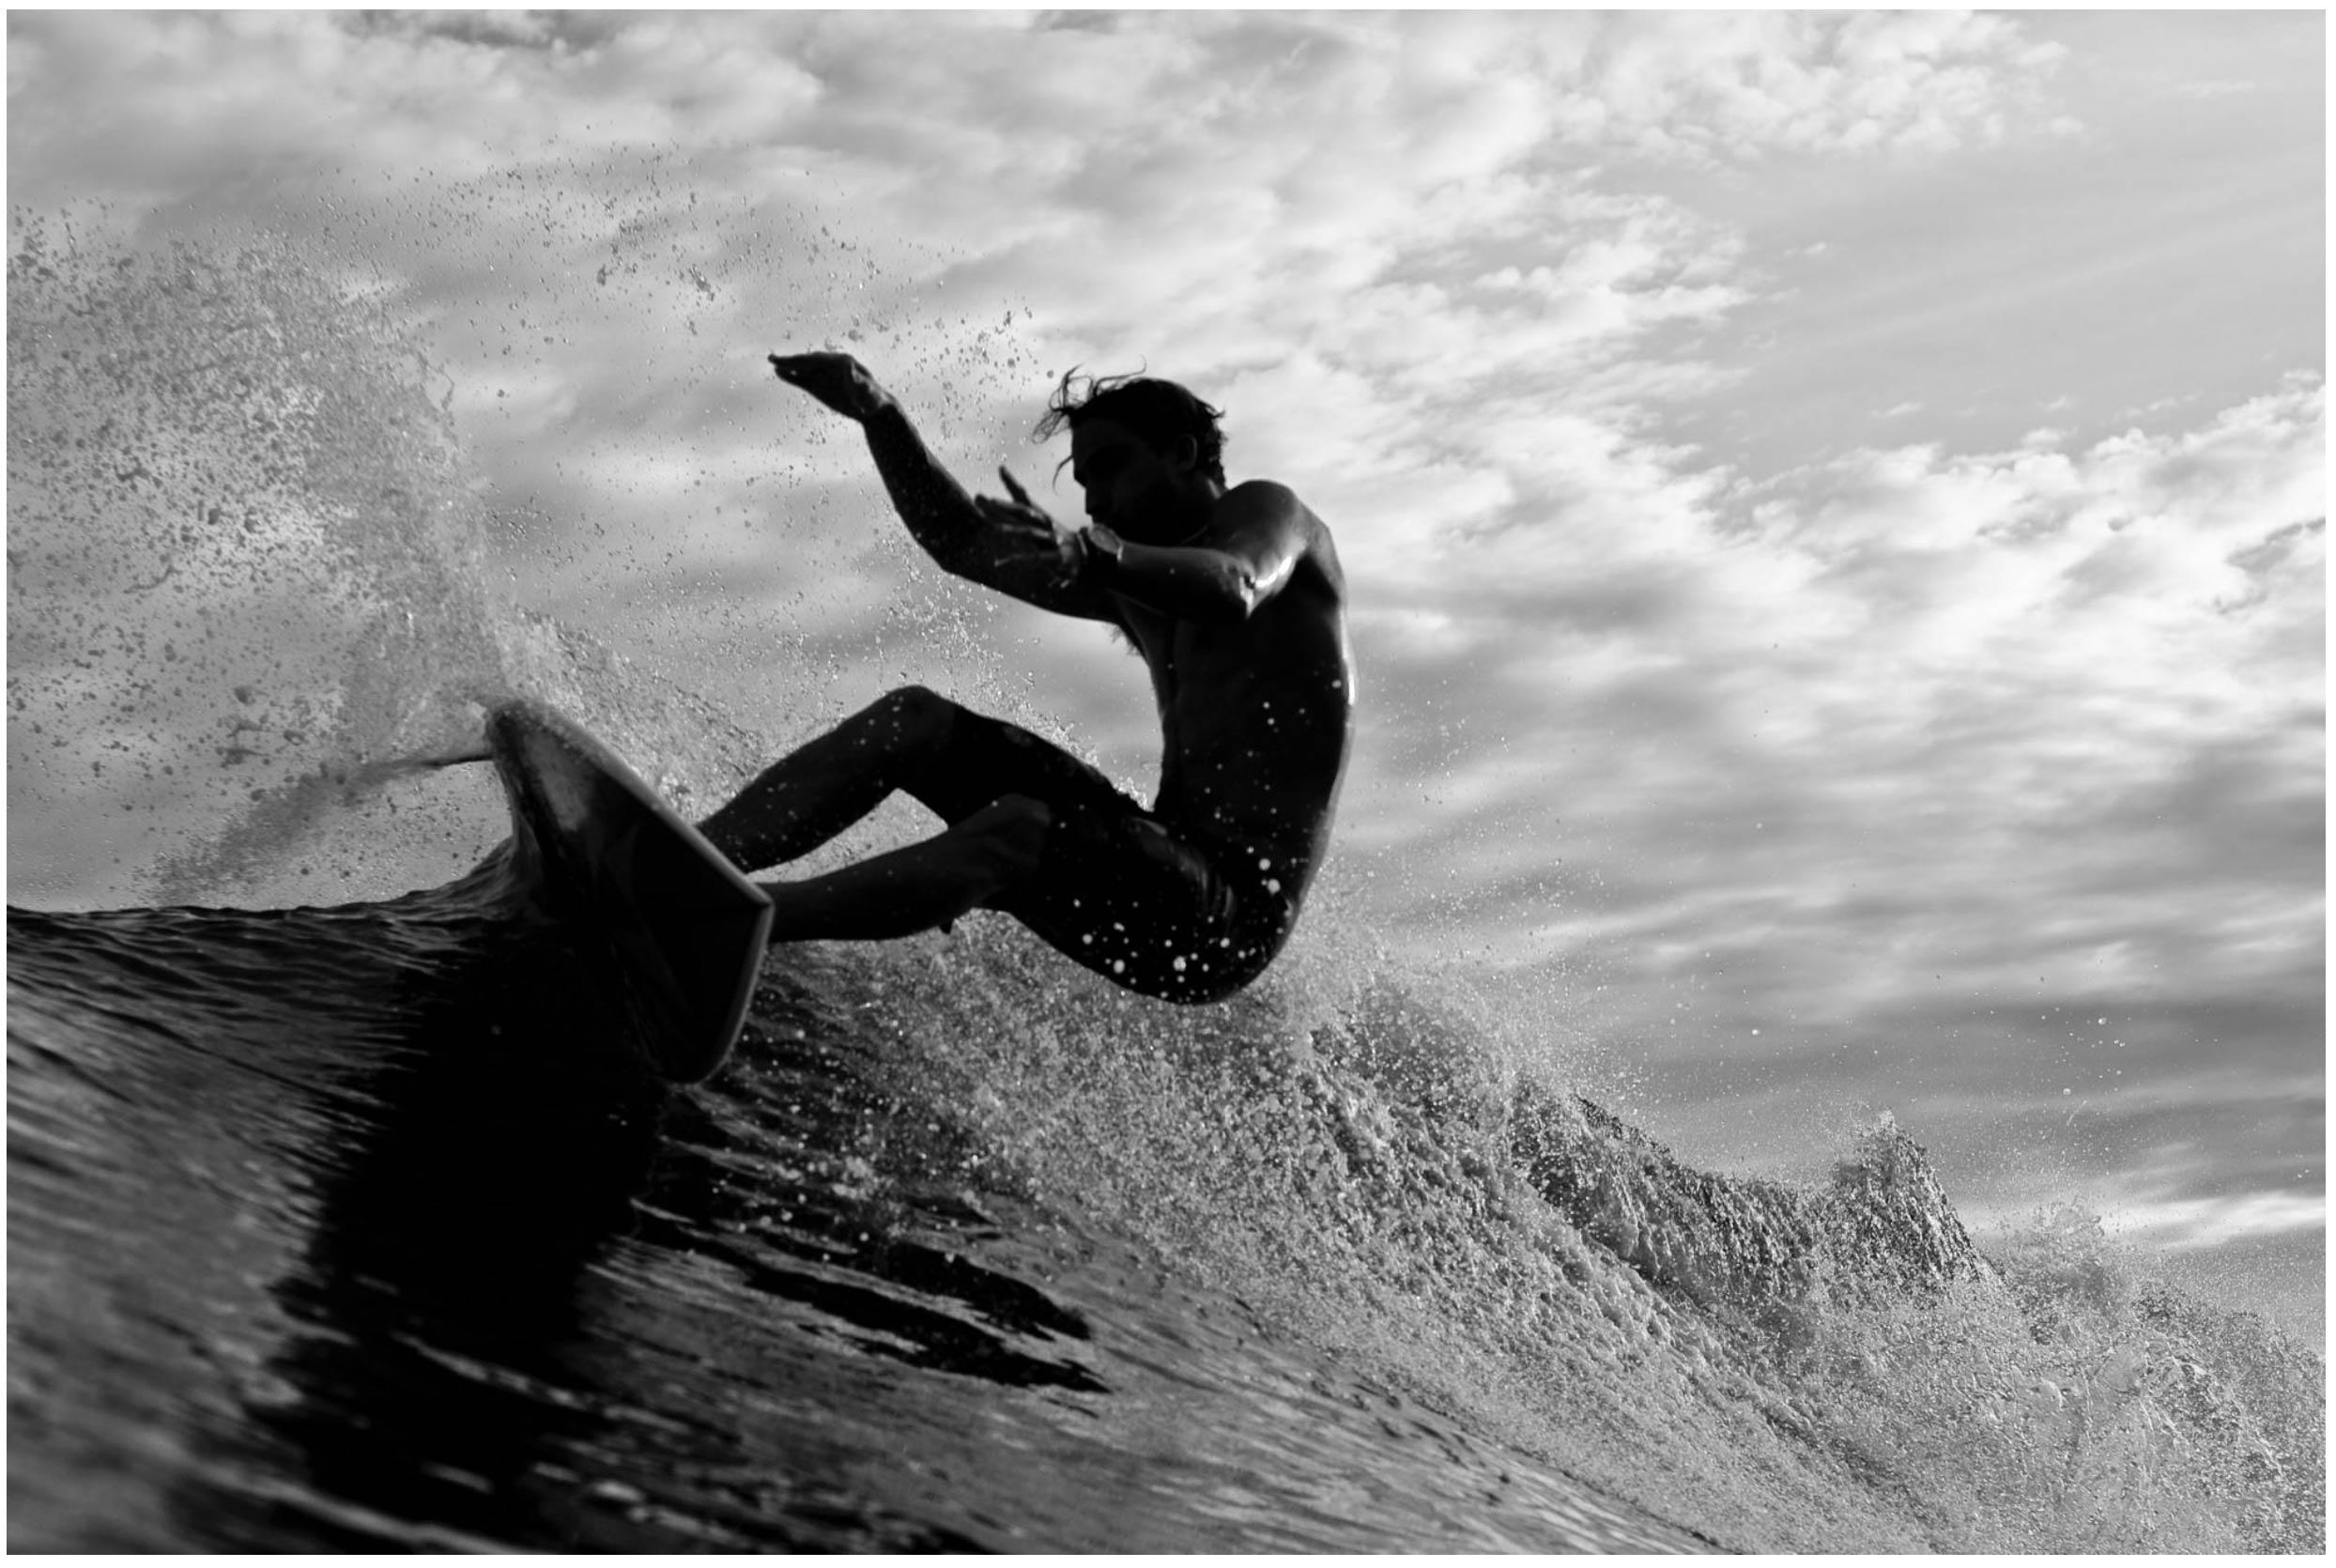 rodd-owen-surf-photography-for-sale-owenphoto-258.jpg